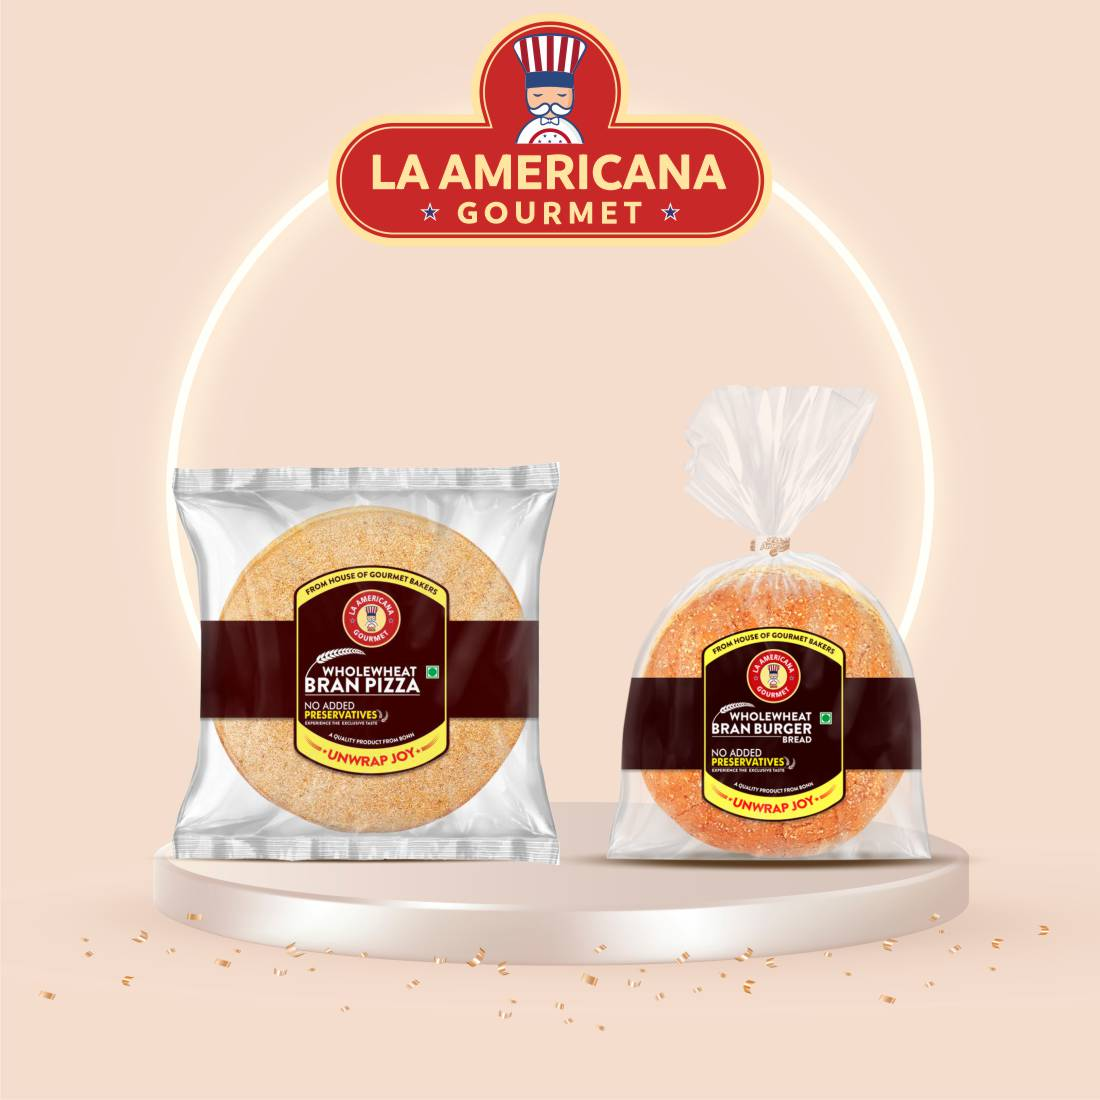 La Americana Wholewheat Bran Burger 150g, and La Americana Wholewheat Bran Pizza 200g, (Pack of 1 each)